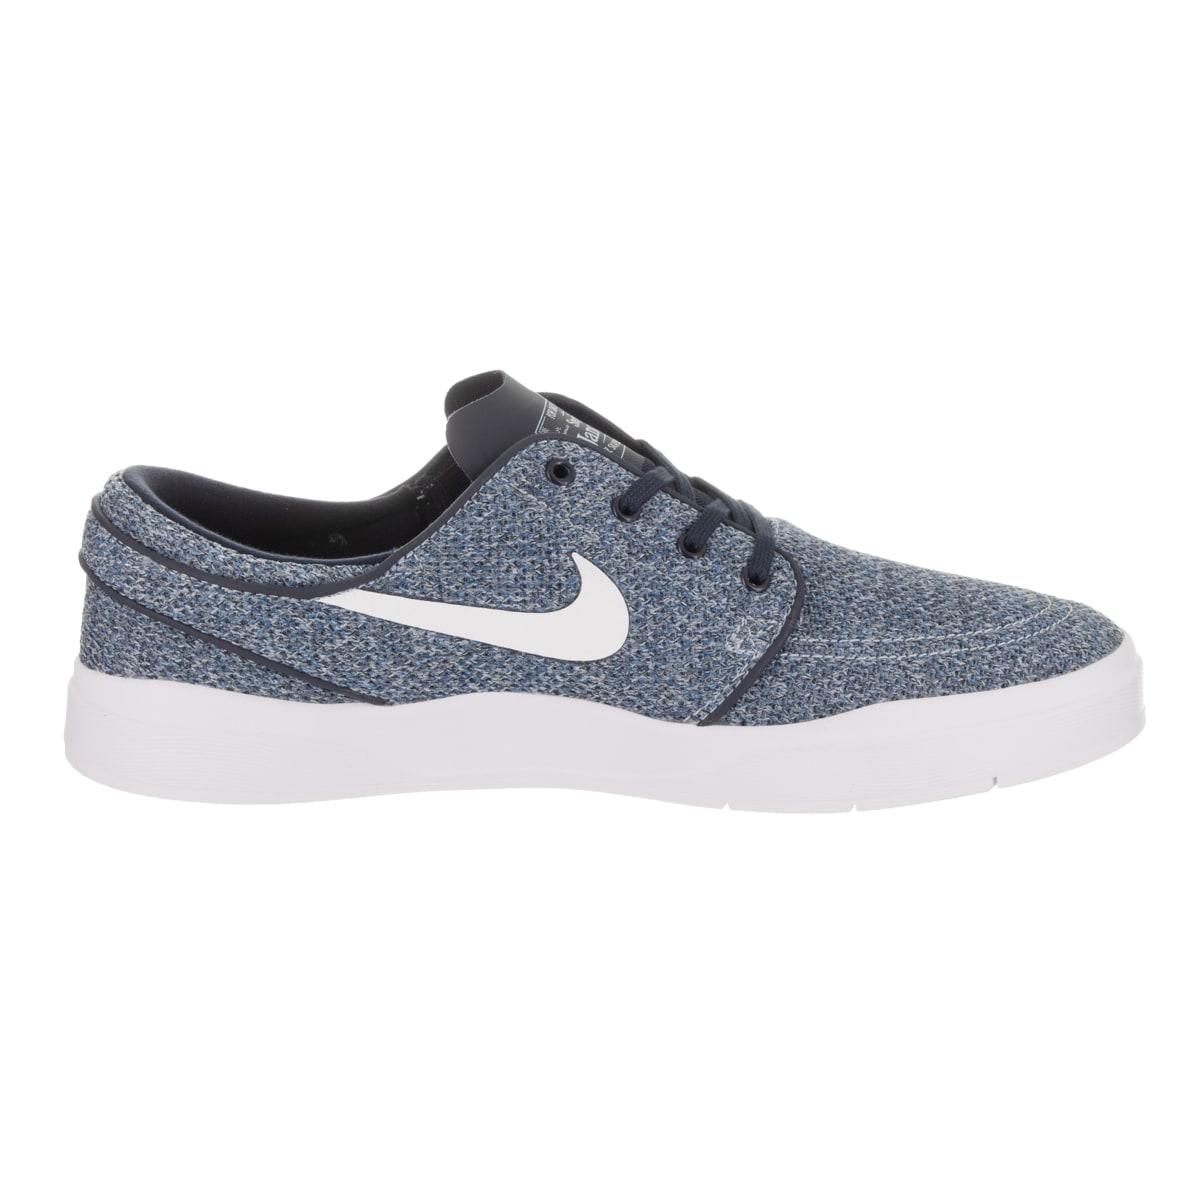 b200984deb3732 Shop Nike Men s SB Janoski Hyperfeel Mesh Blue Textile Skate Shoes - Free  Shipping Today - Overstock.com - 15269347